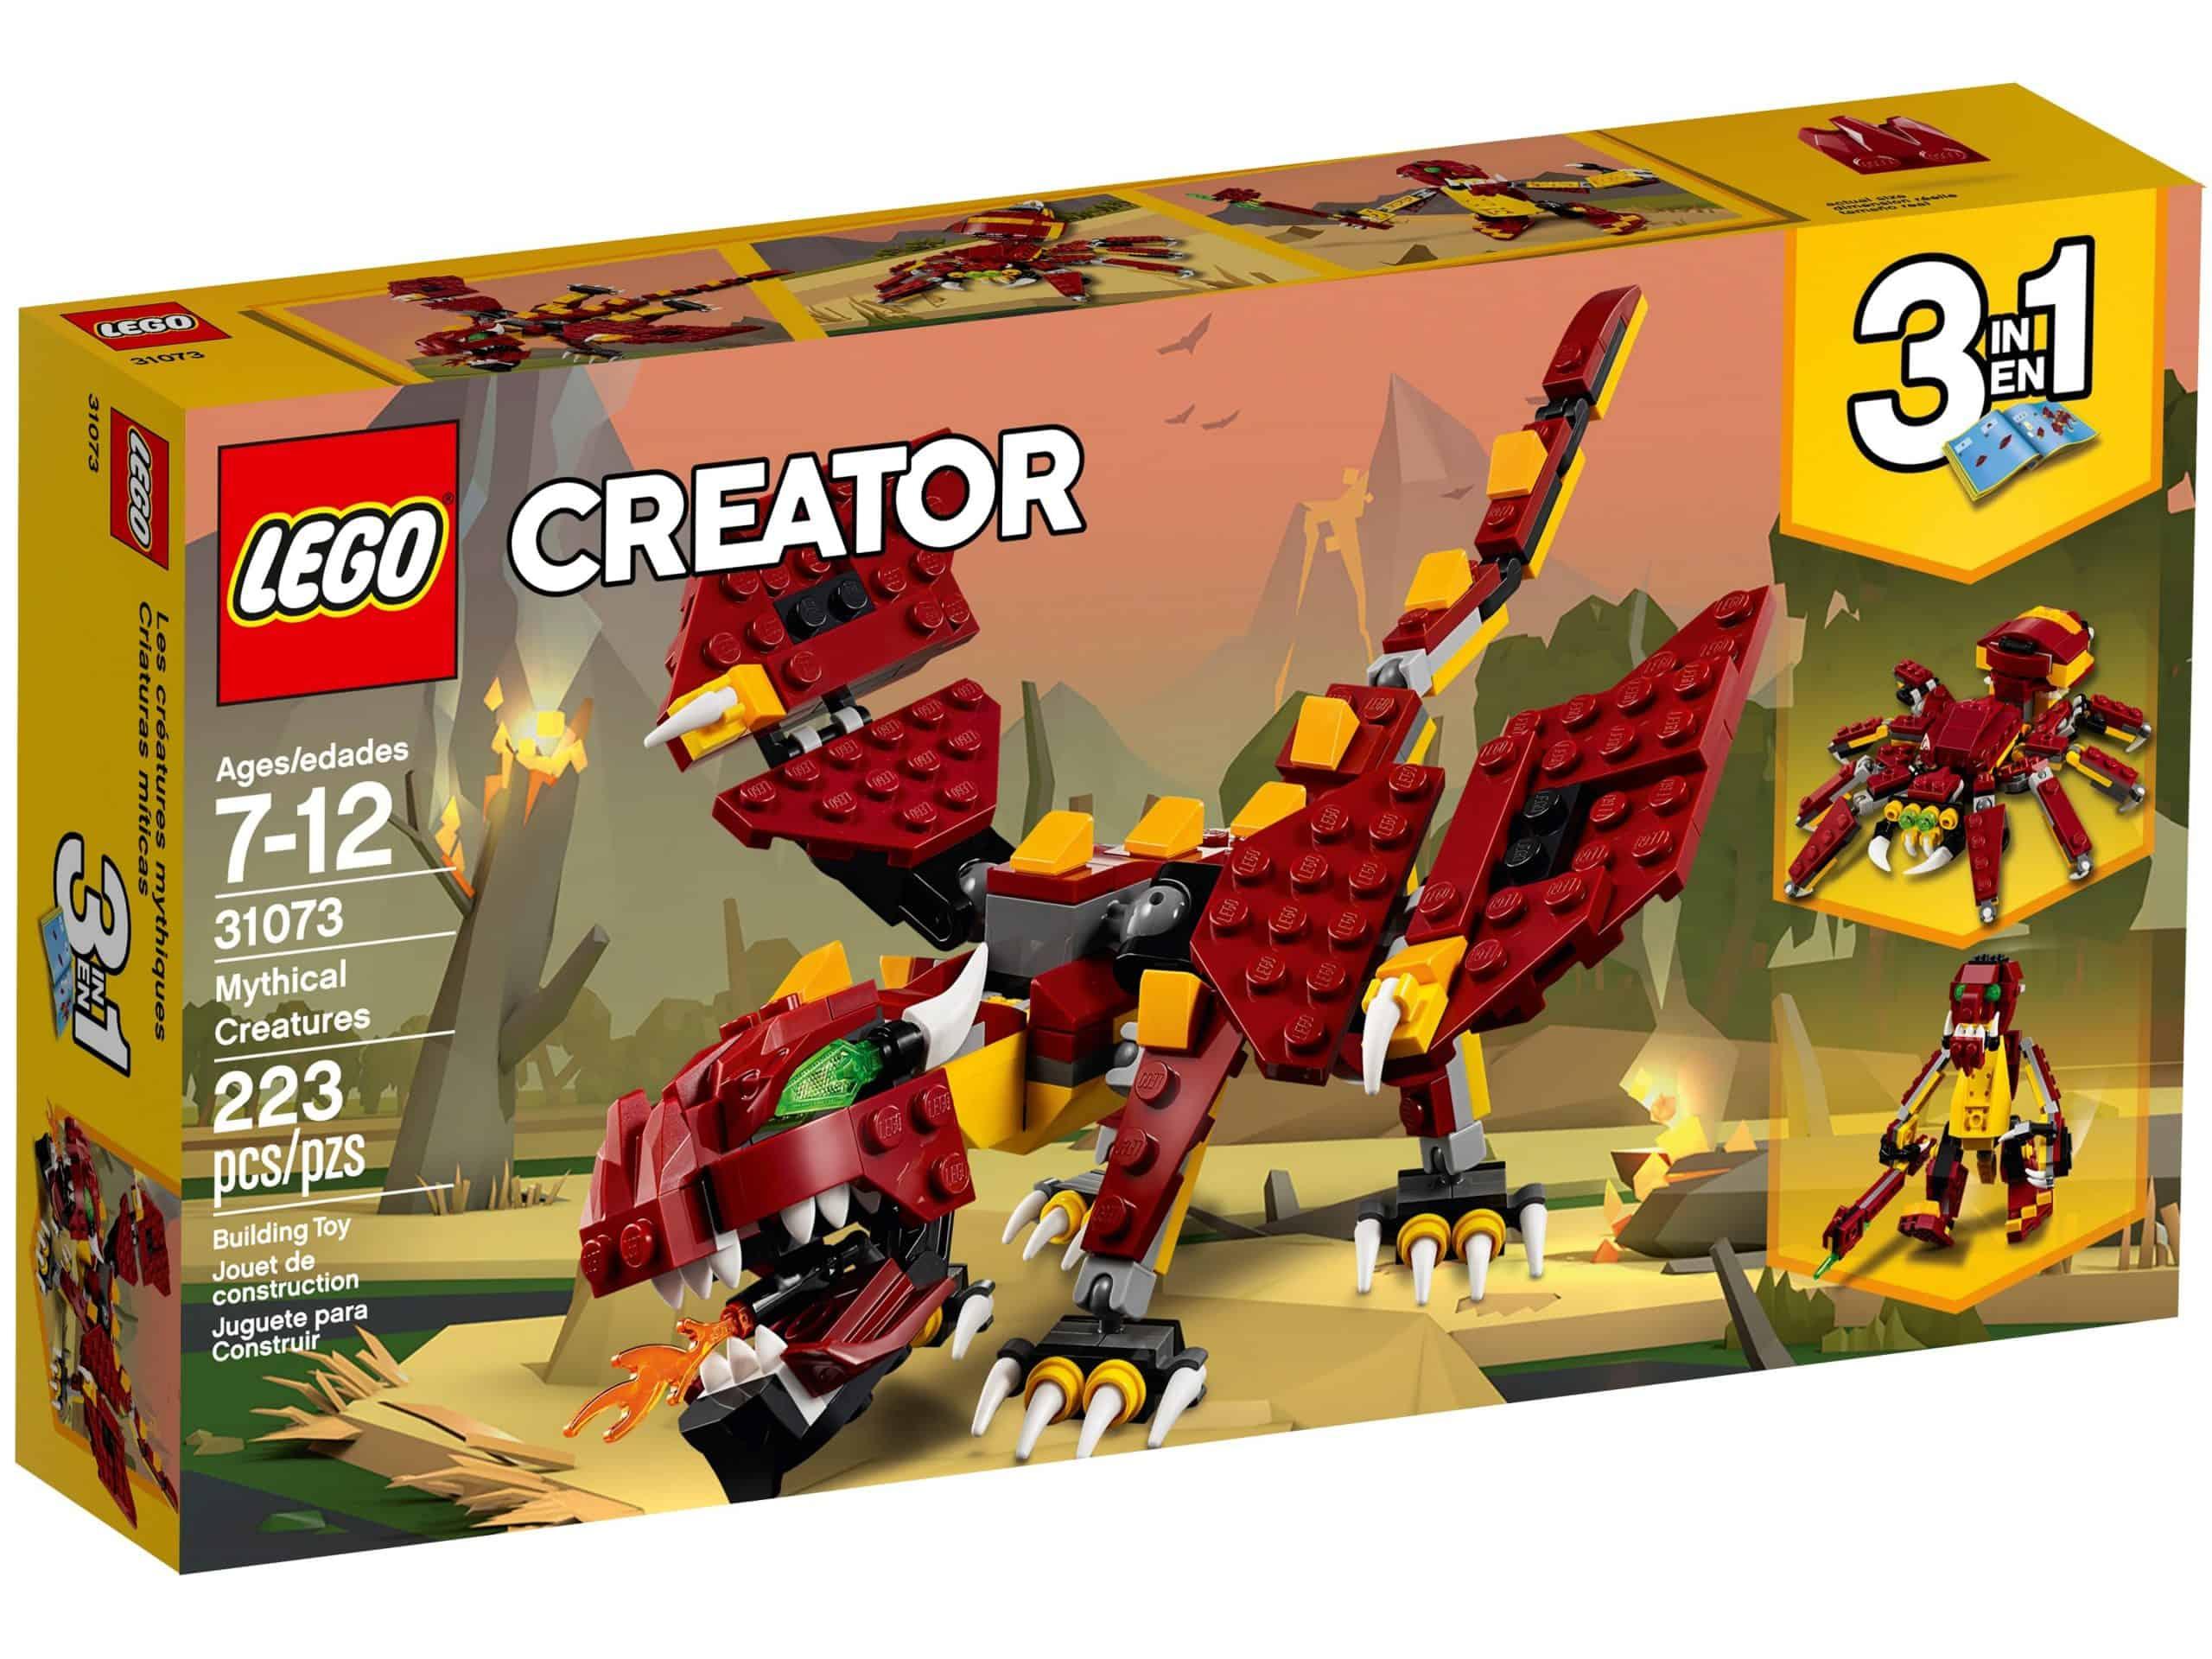 lego 31073 mythical creatures scaled